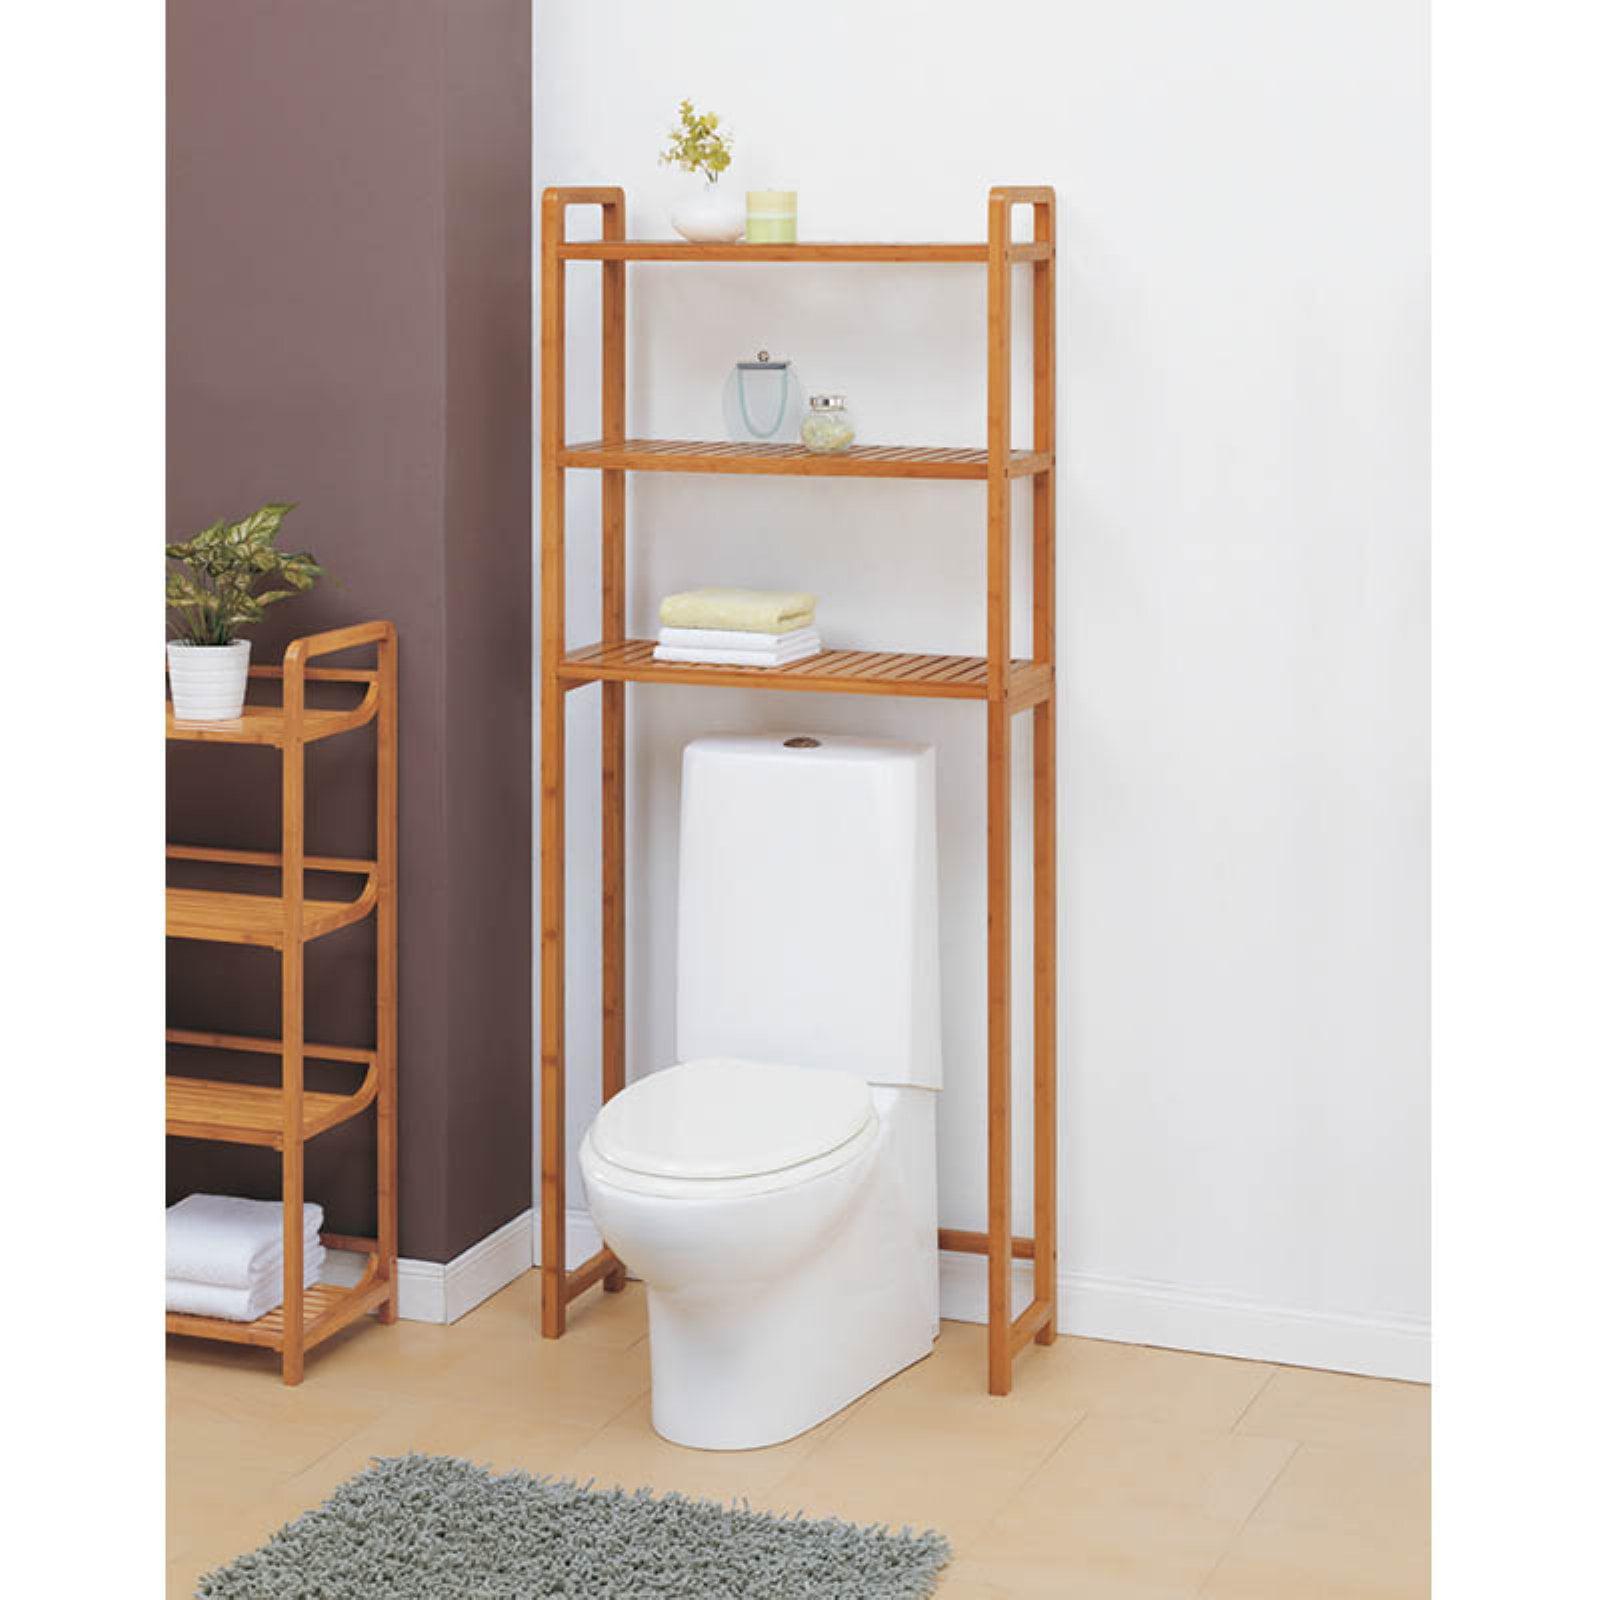 Organize It All Lohas 29941W-1 Bathroom Spacesaver